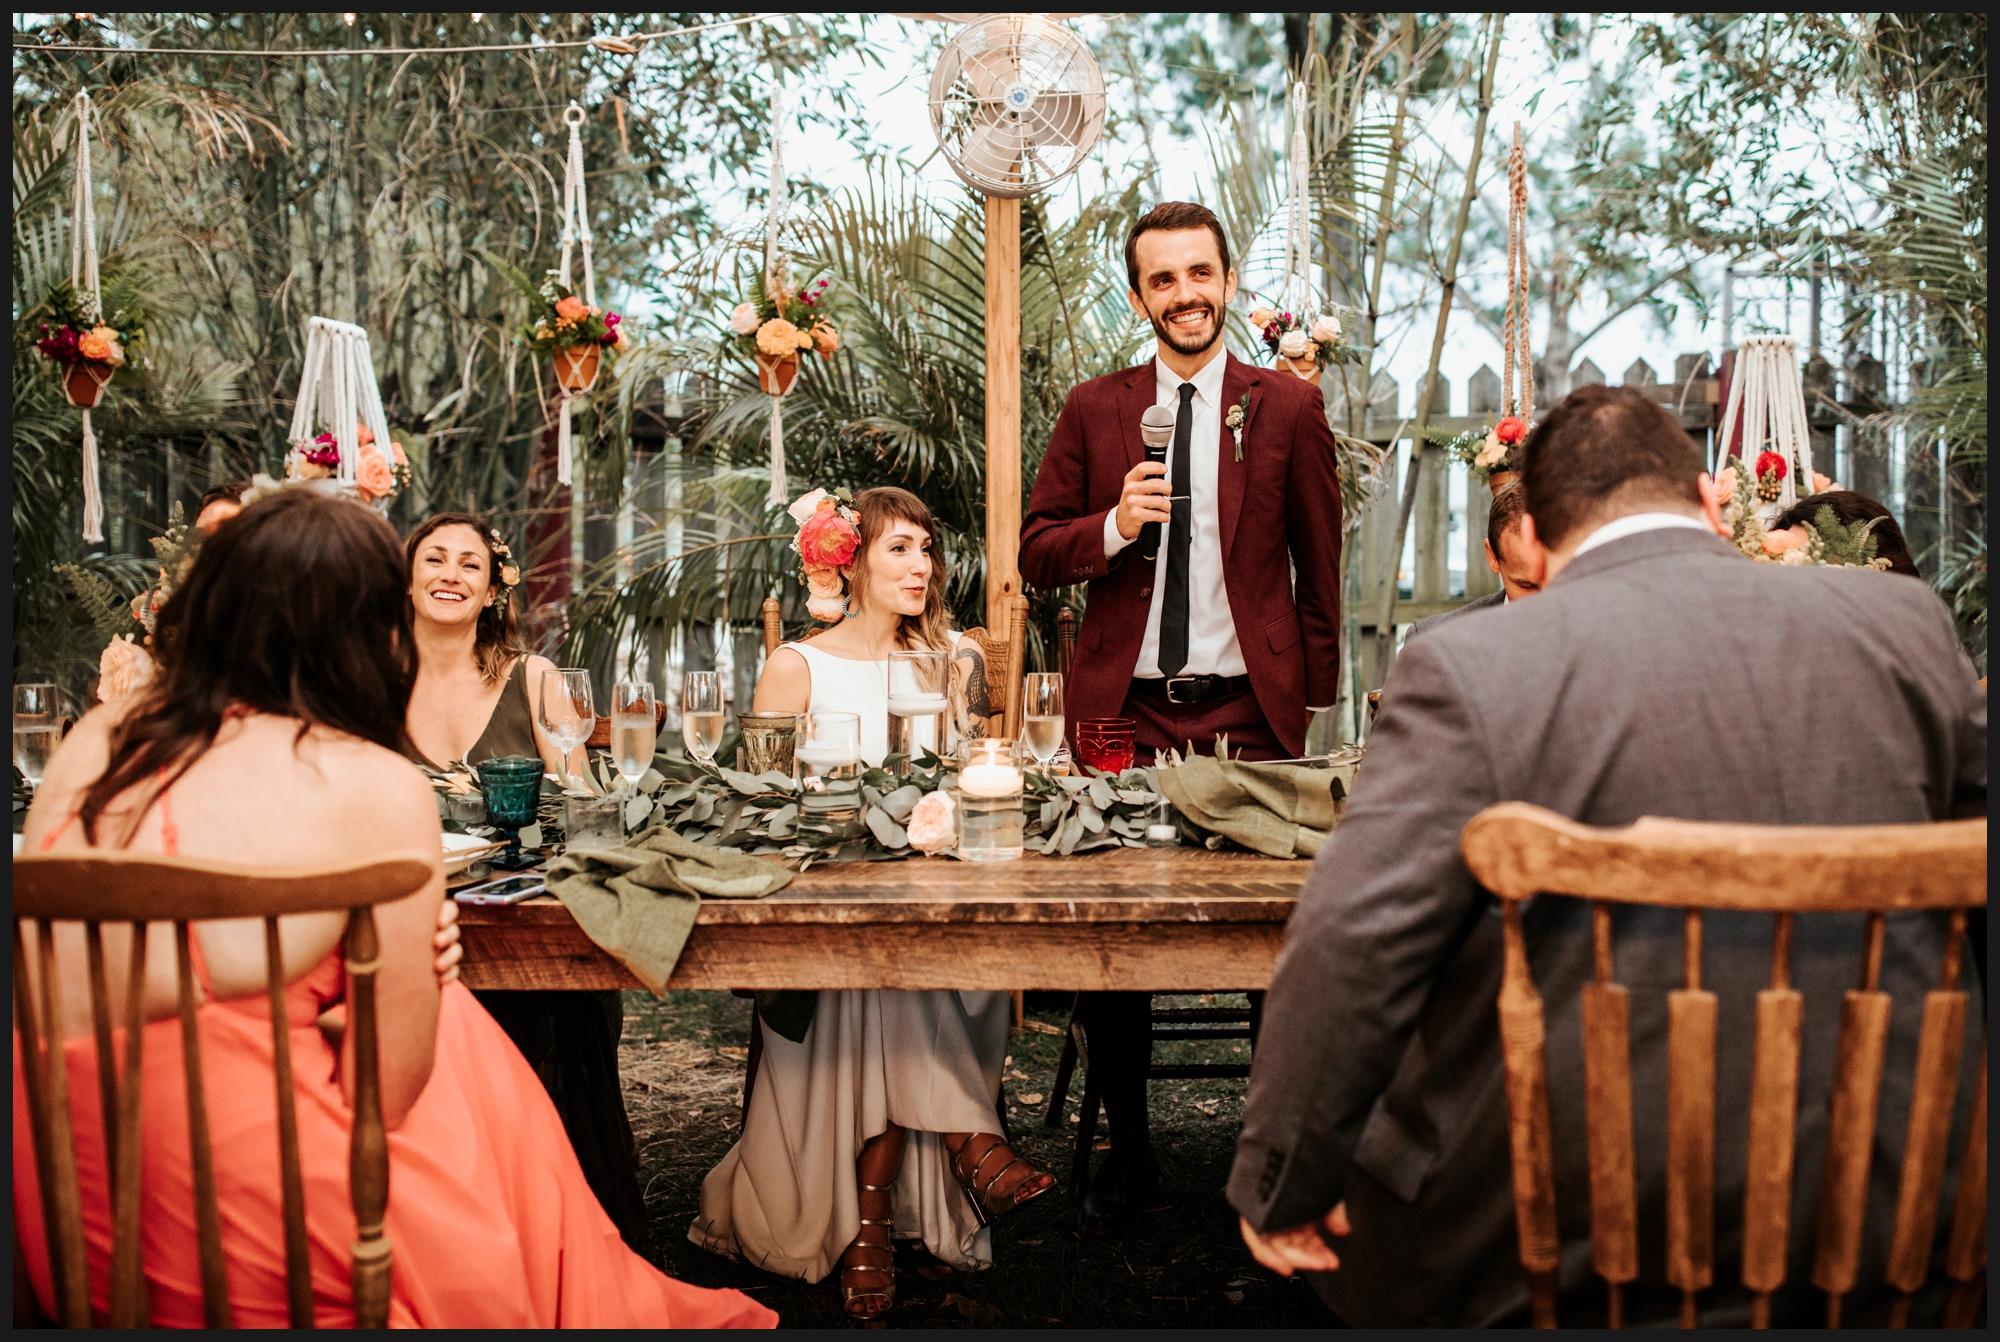 Orlando-Wedding-Photographer-destination-wedding-photographer-florida-wedding-photographer-bohemian-wedding-photographer_2040.jpg